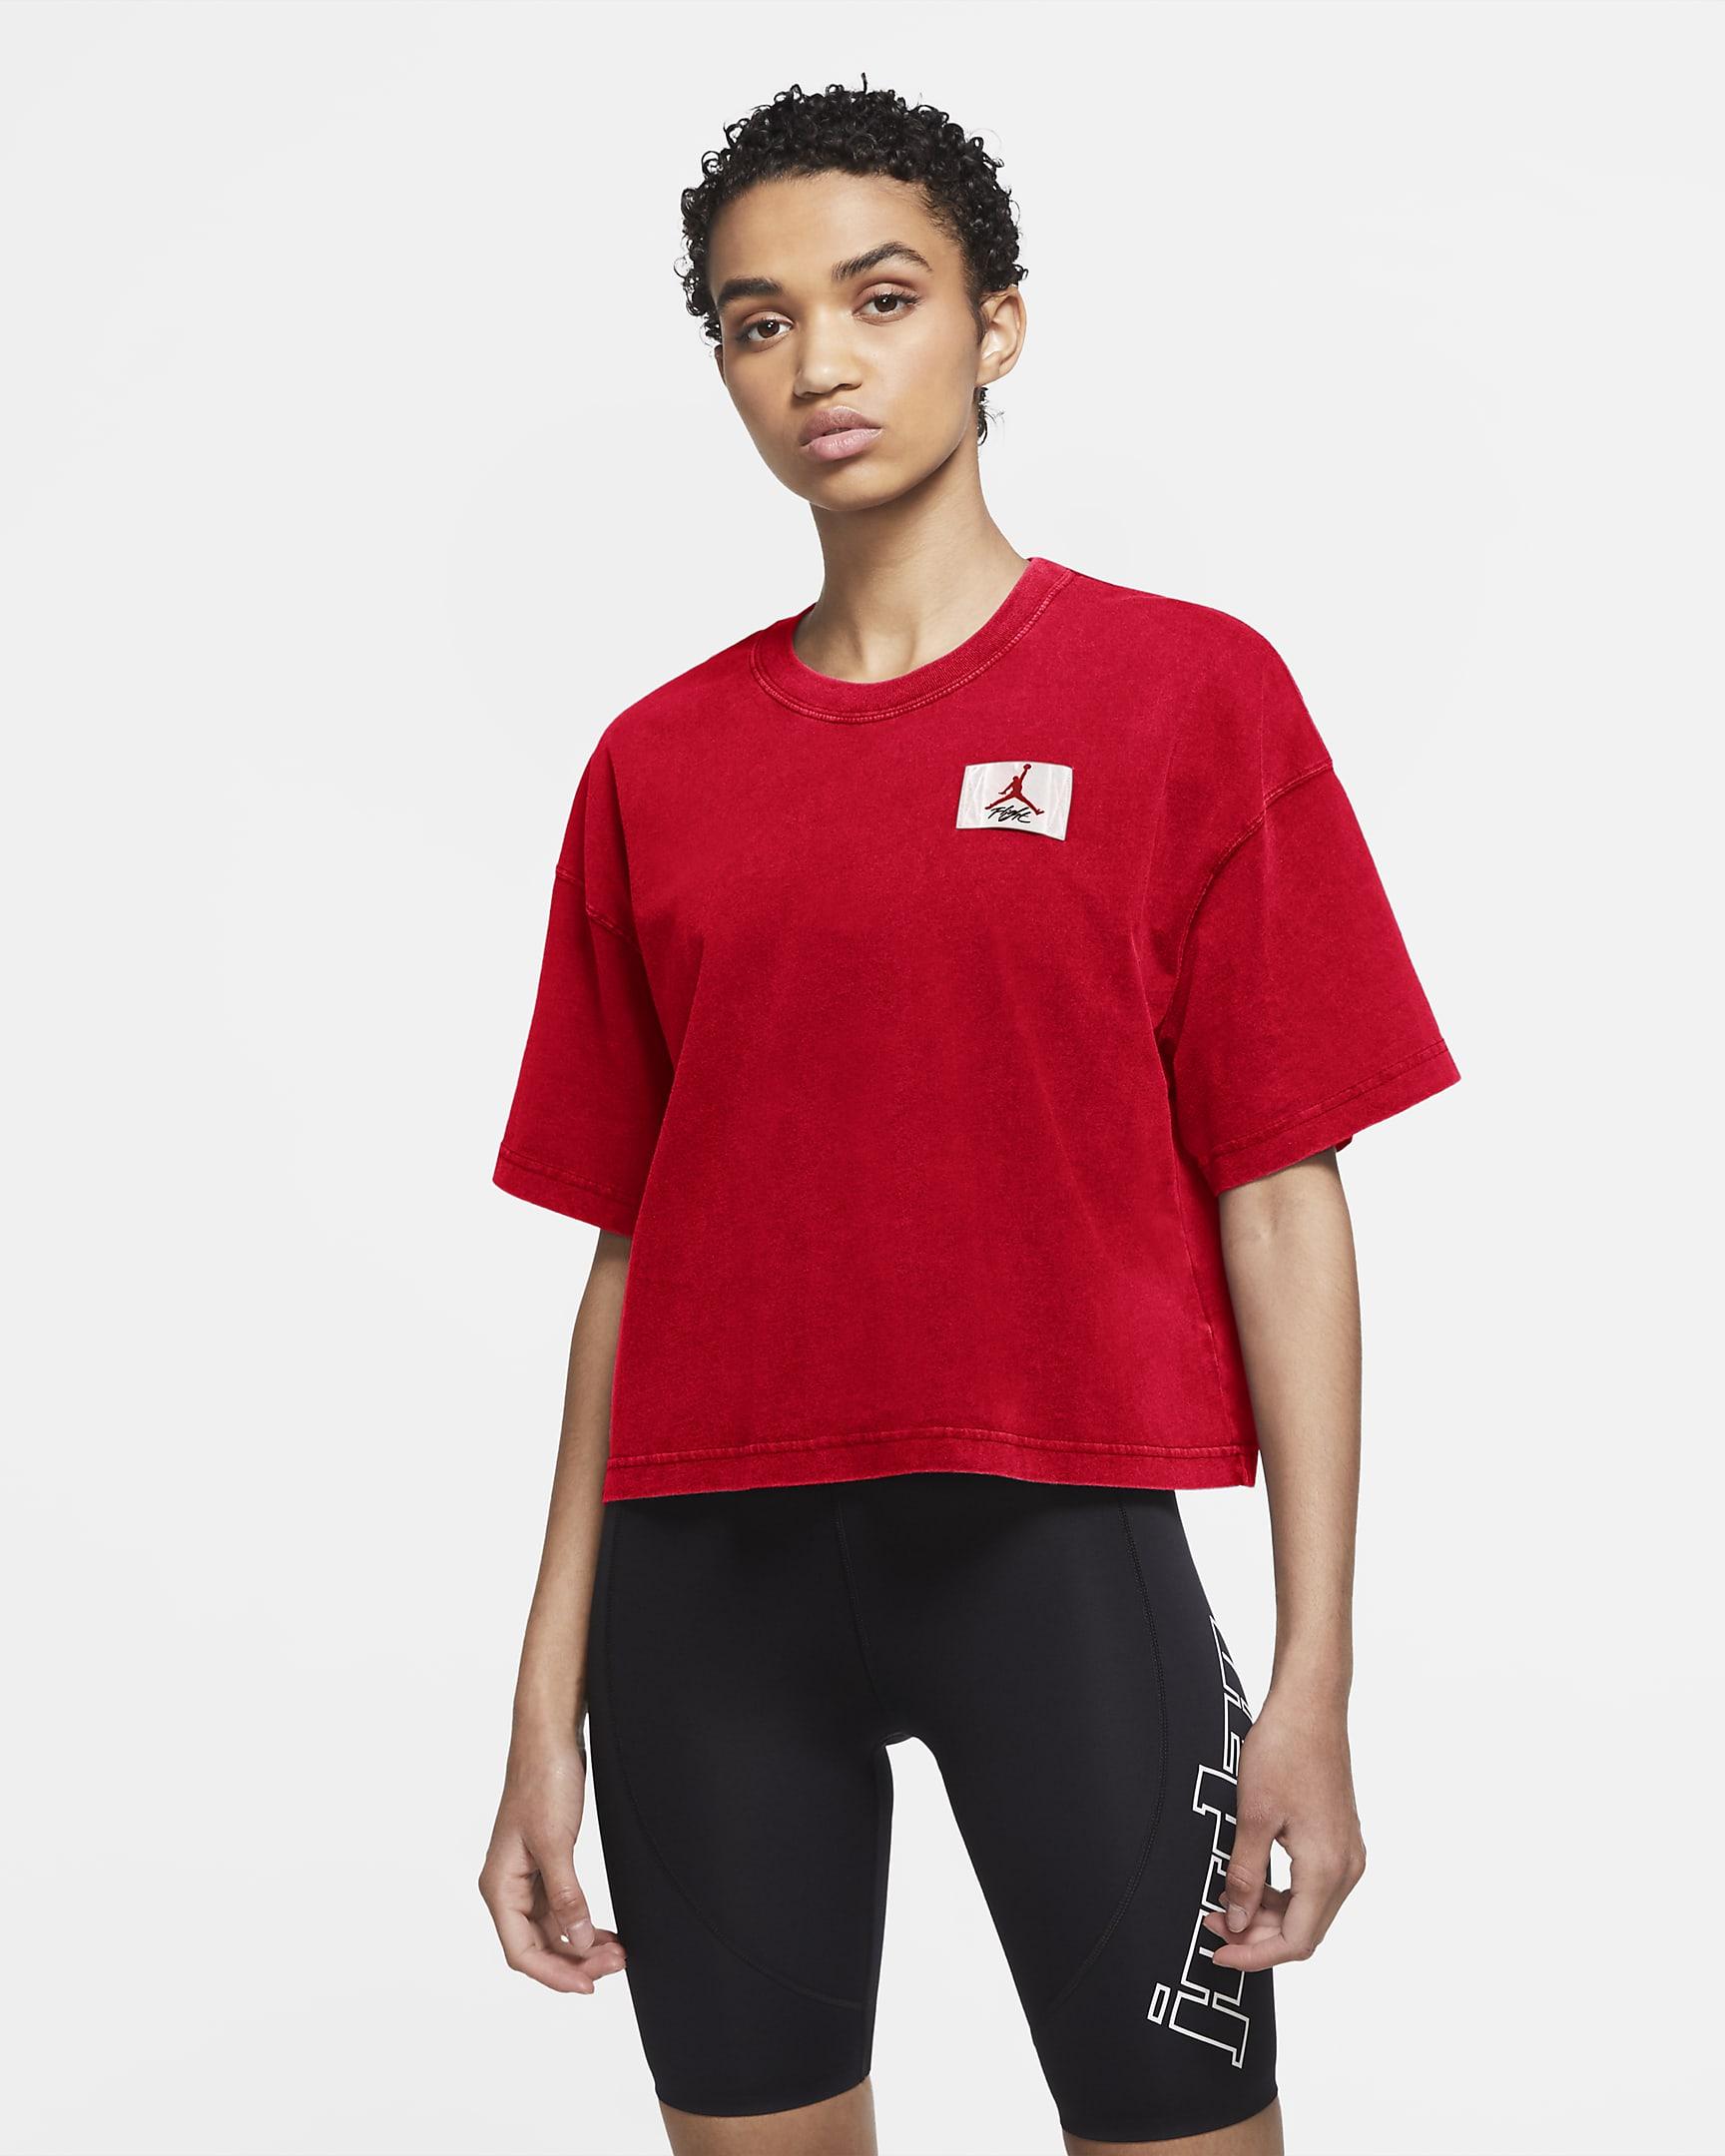 jordan-essentials-womens-short-sleeve-boxy-t-shirt-9xLPQl.png